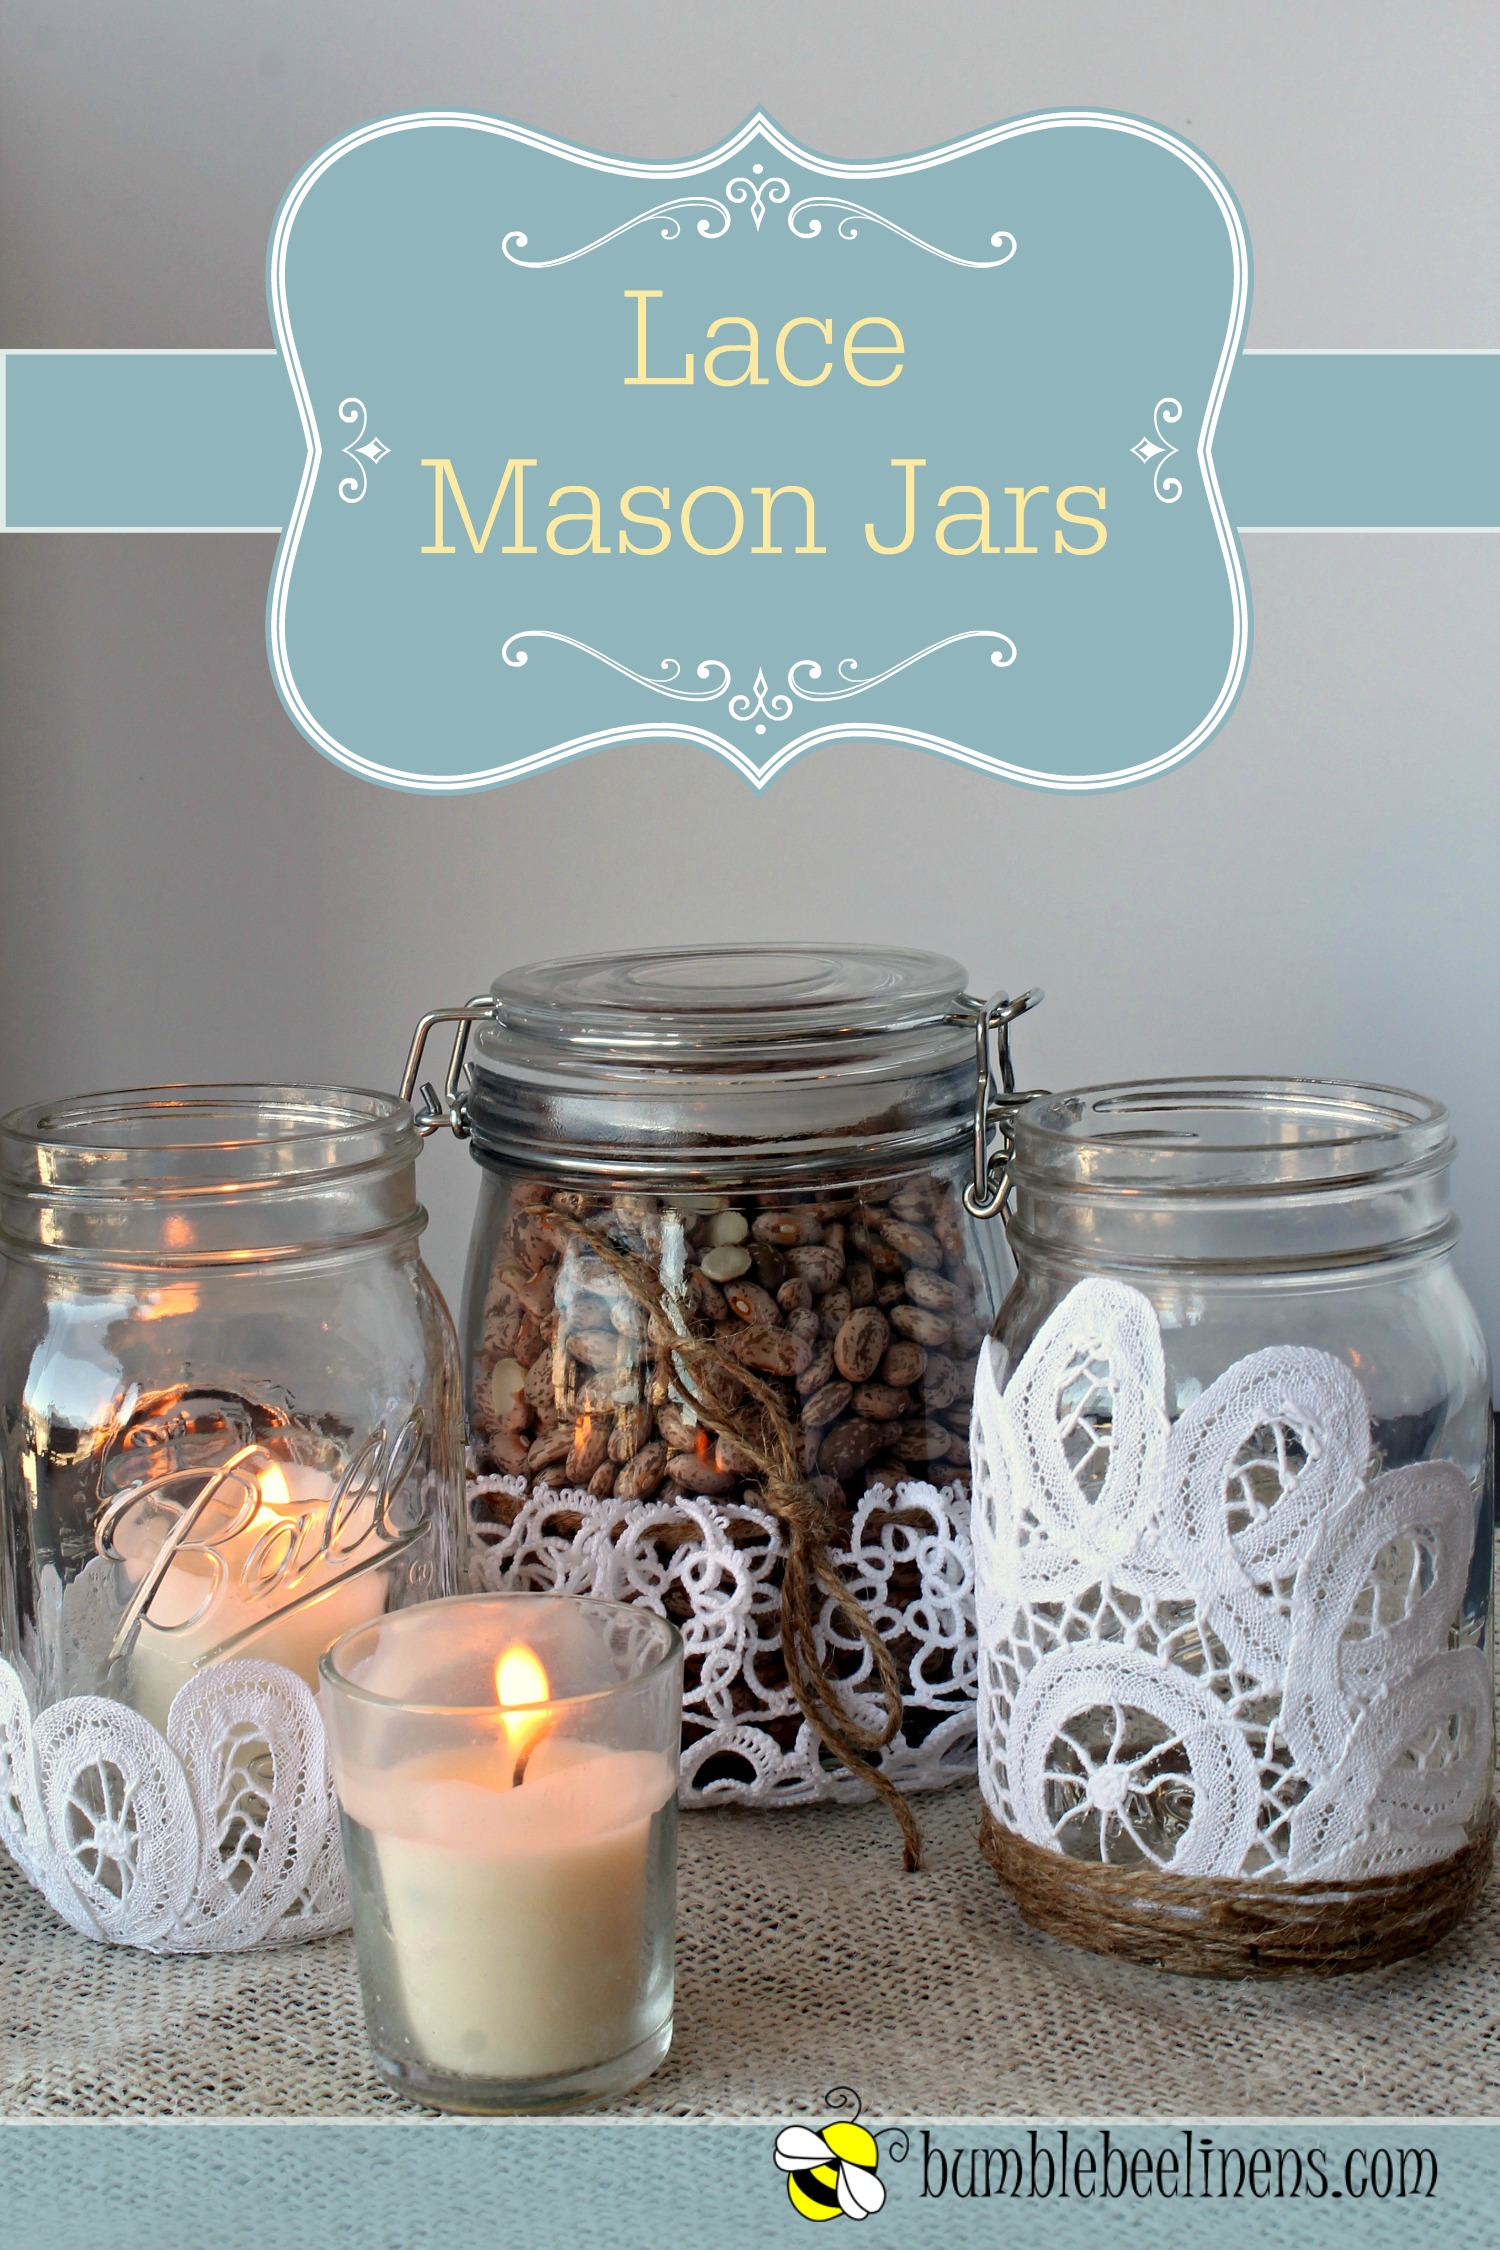 Free-Bee | Sweet Little Wood |Mason Jar Text